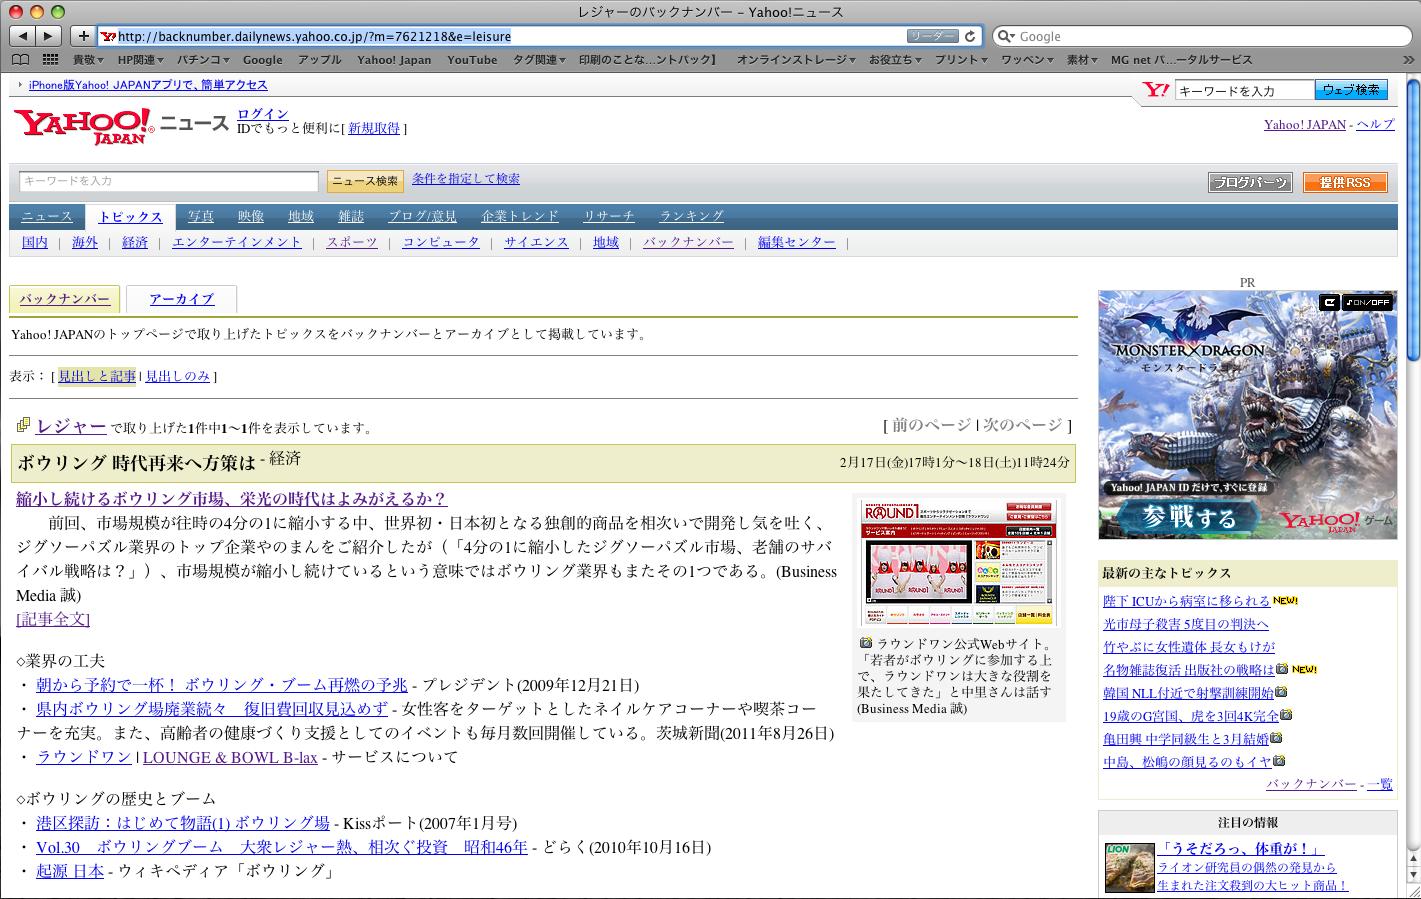 dailynews.yahoo.co.jp